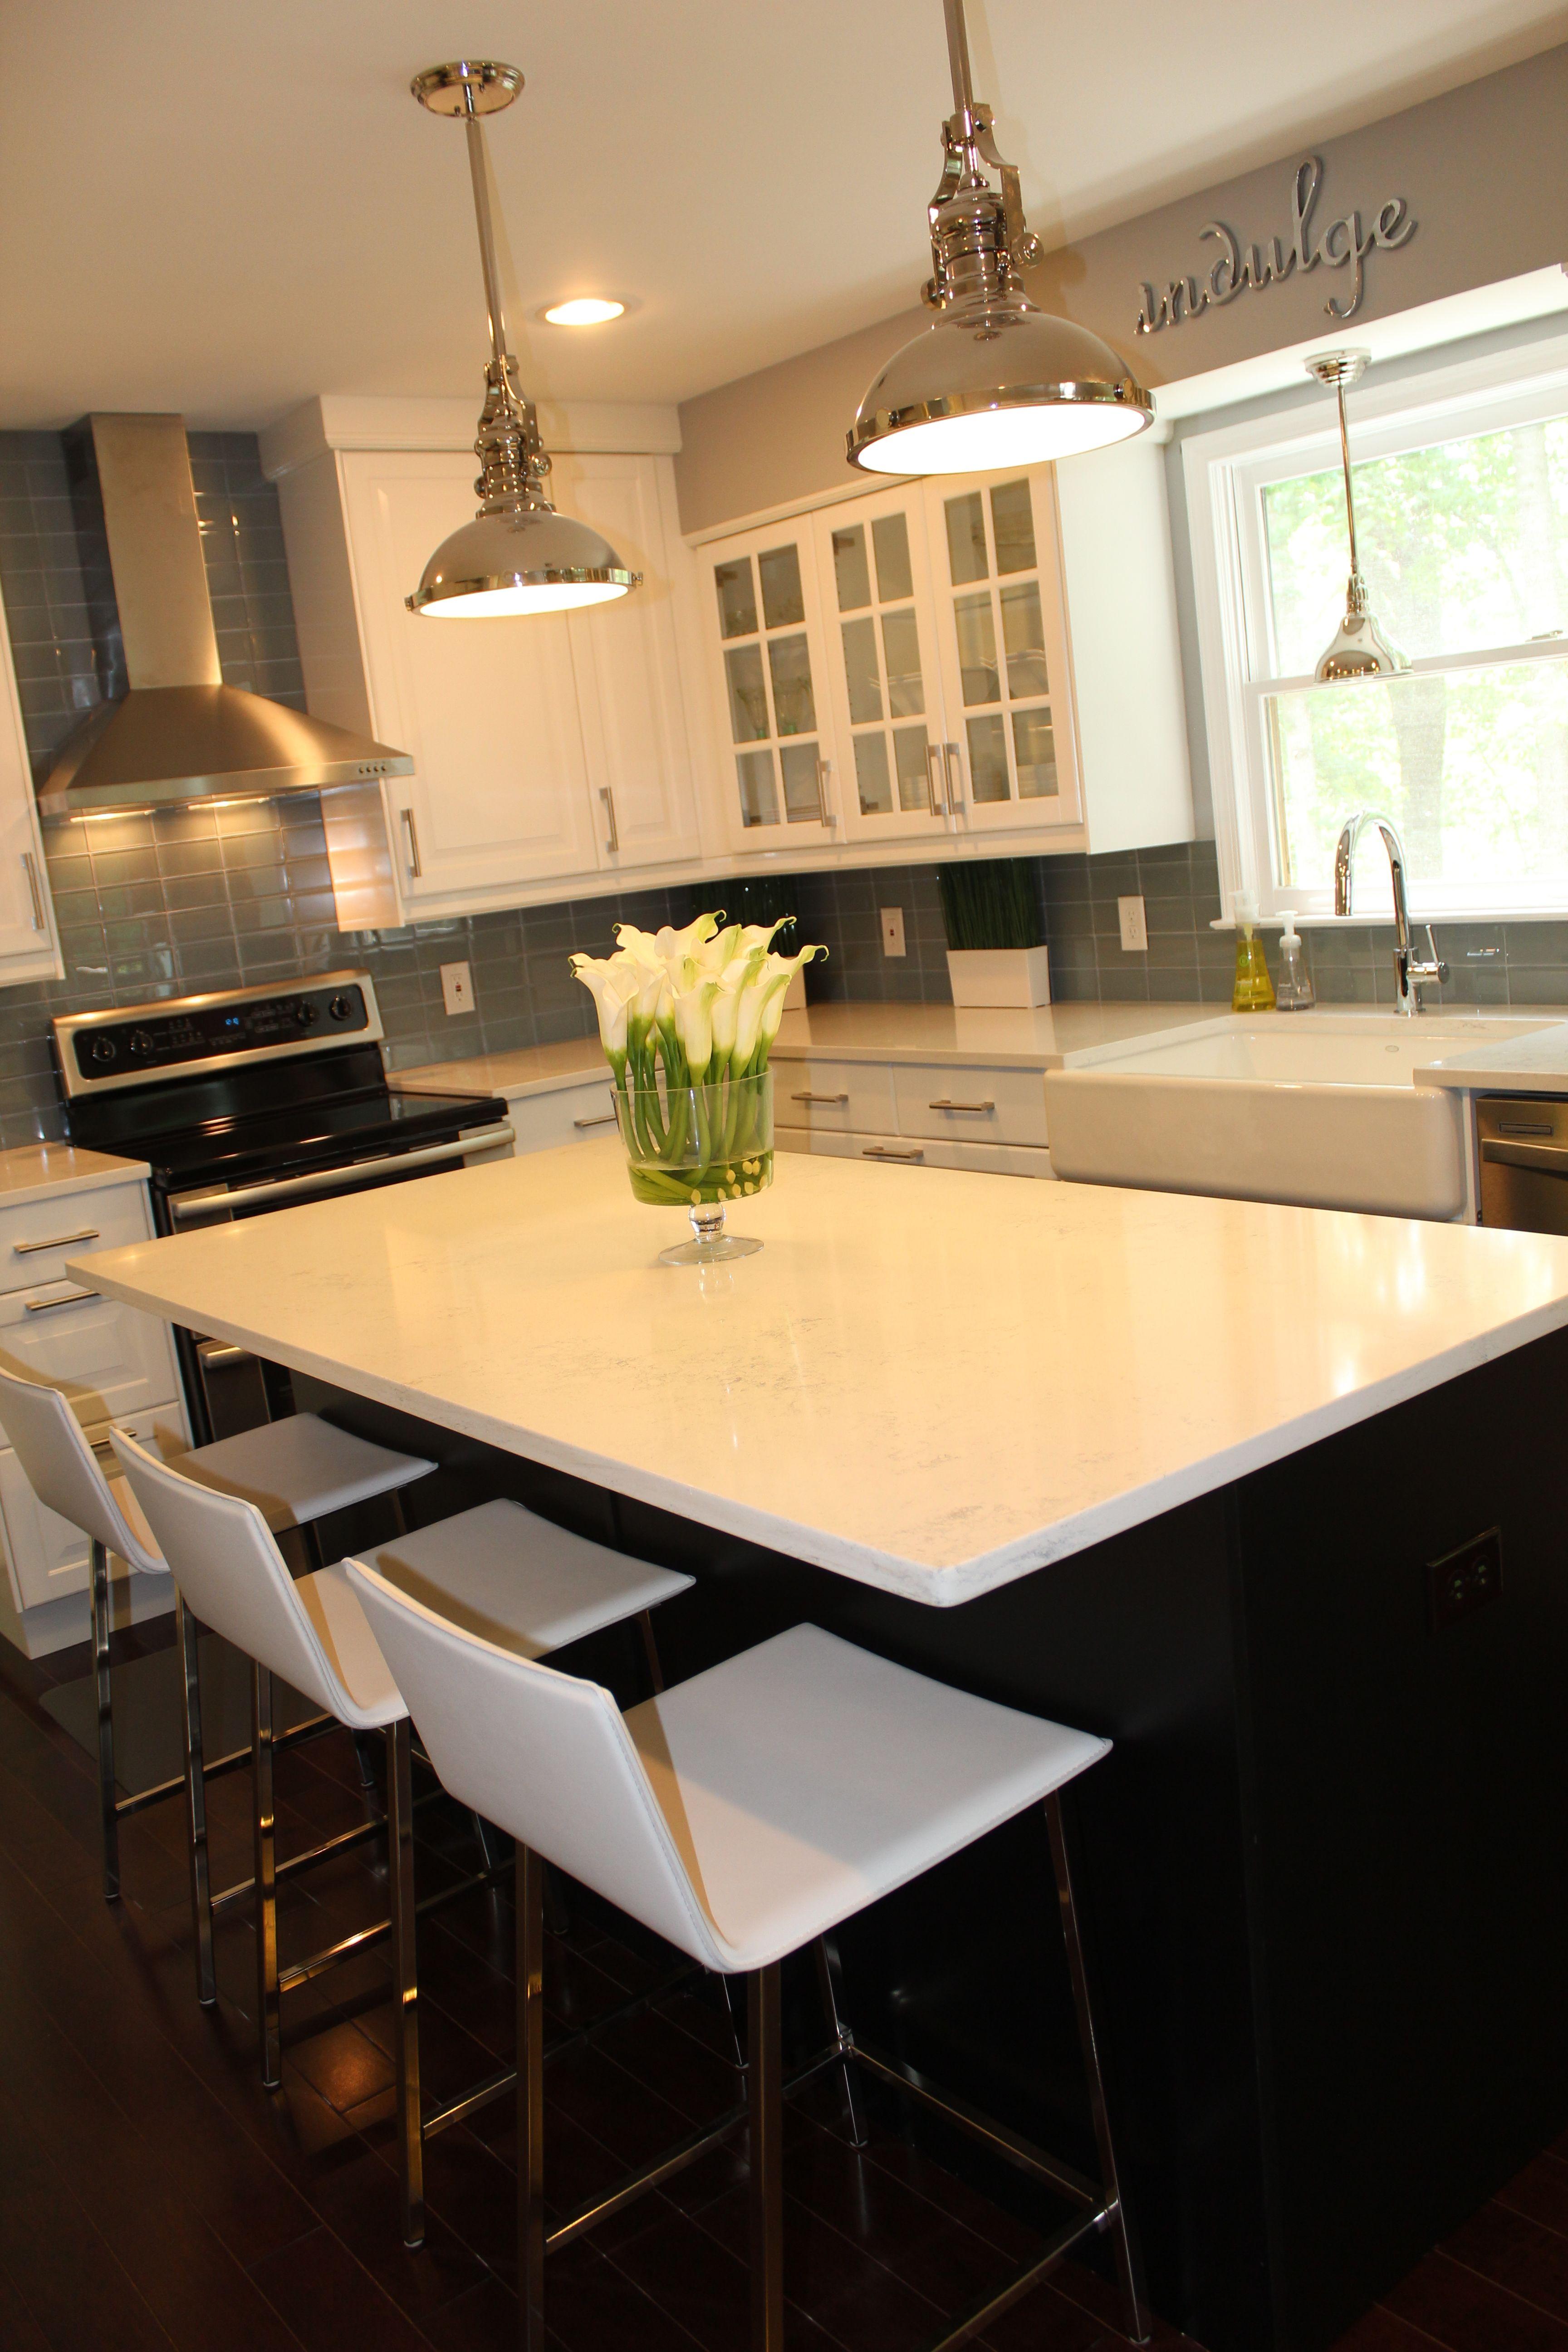 open kitchen layout design interiordesign kitchen layout not bad like island posi on farmhouse kitchen no upper cabinets id=48012